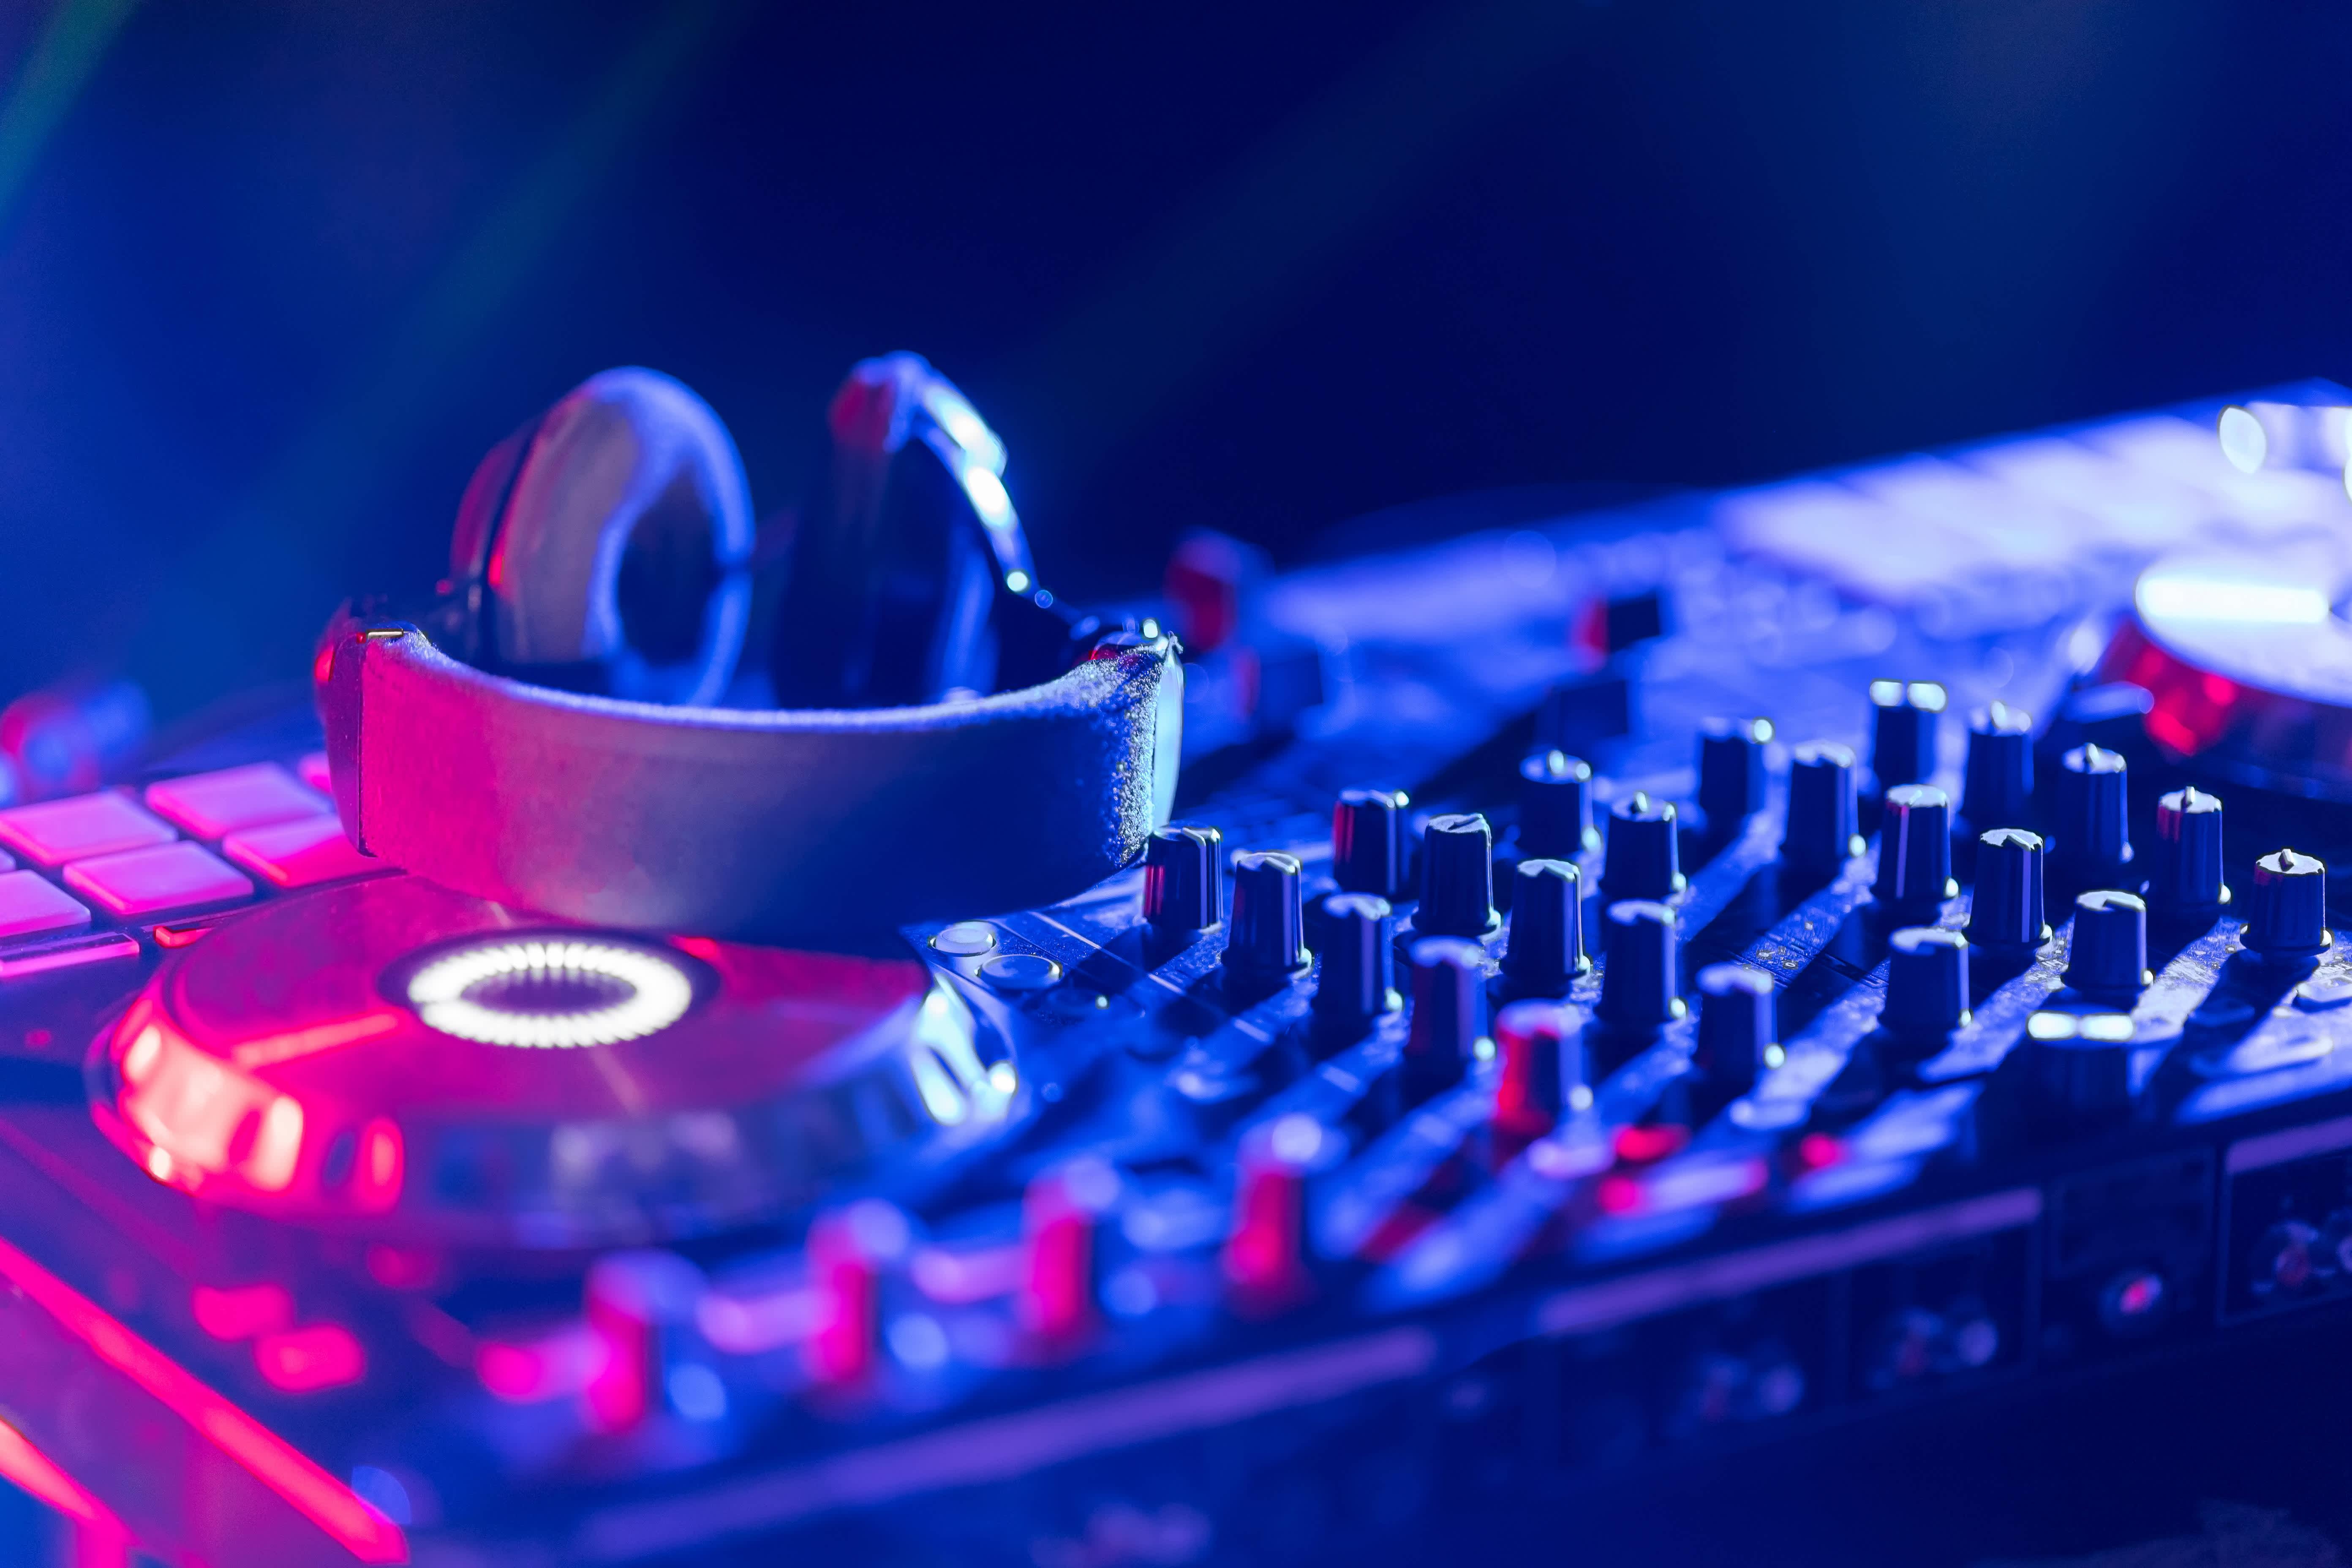 Proms & School Dances DJ